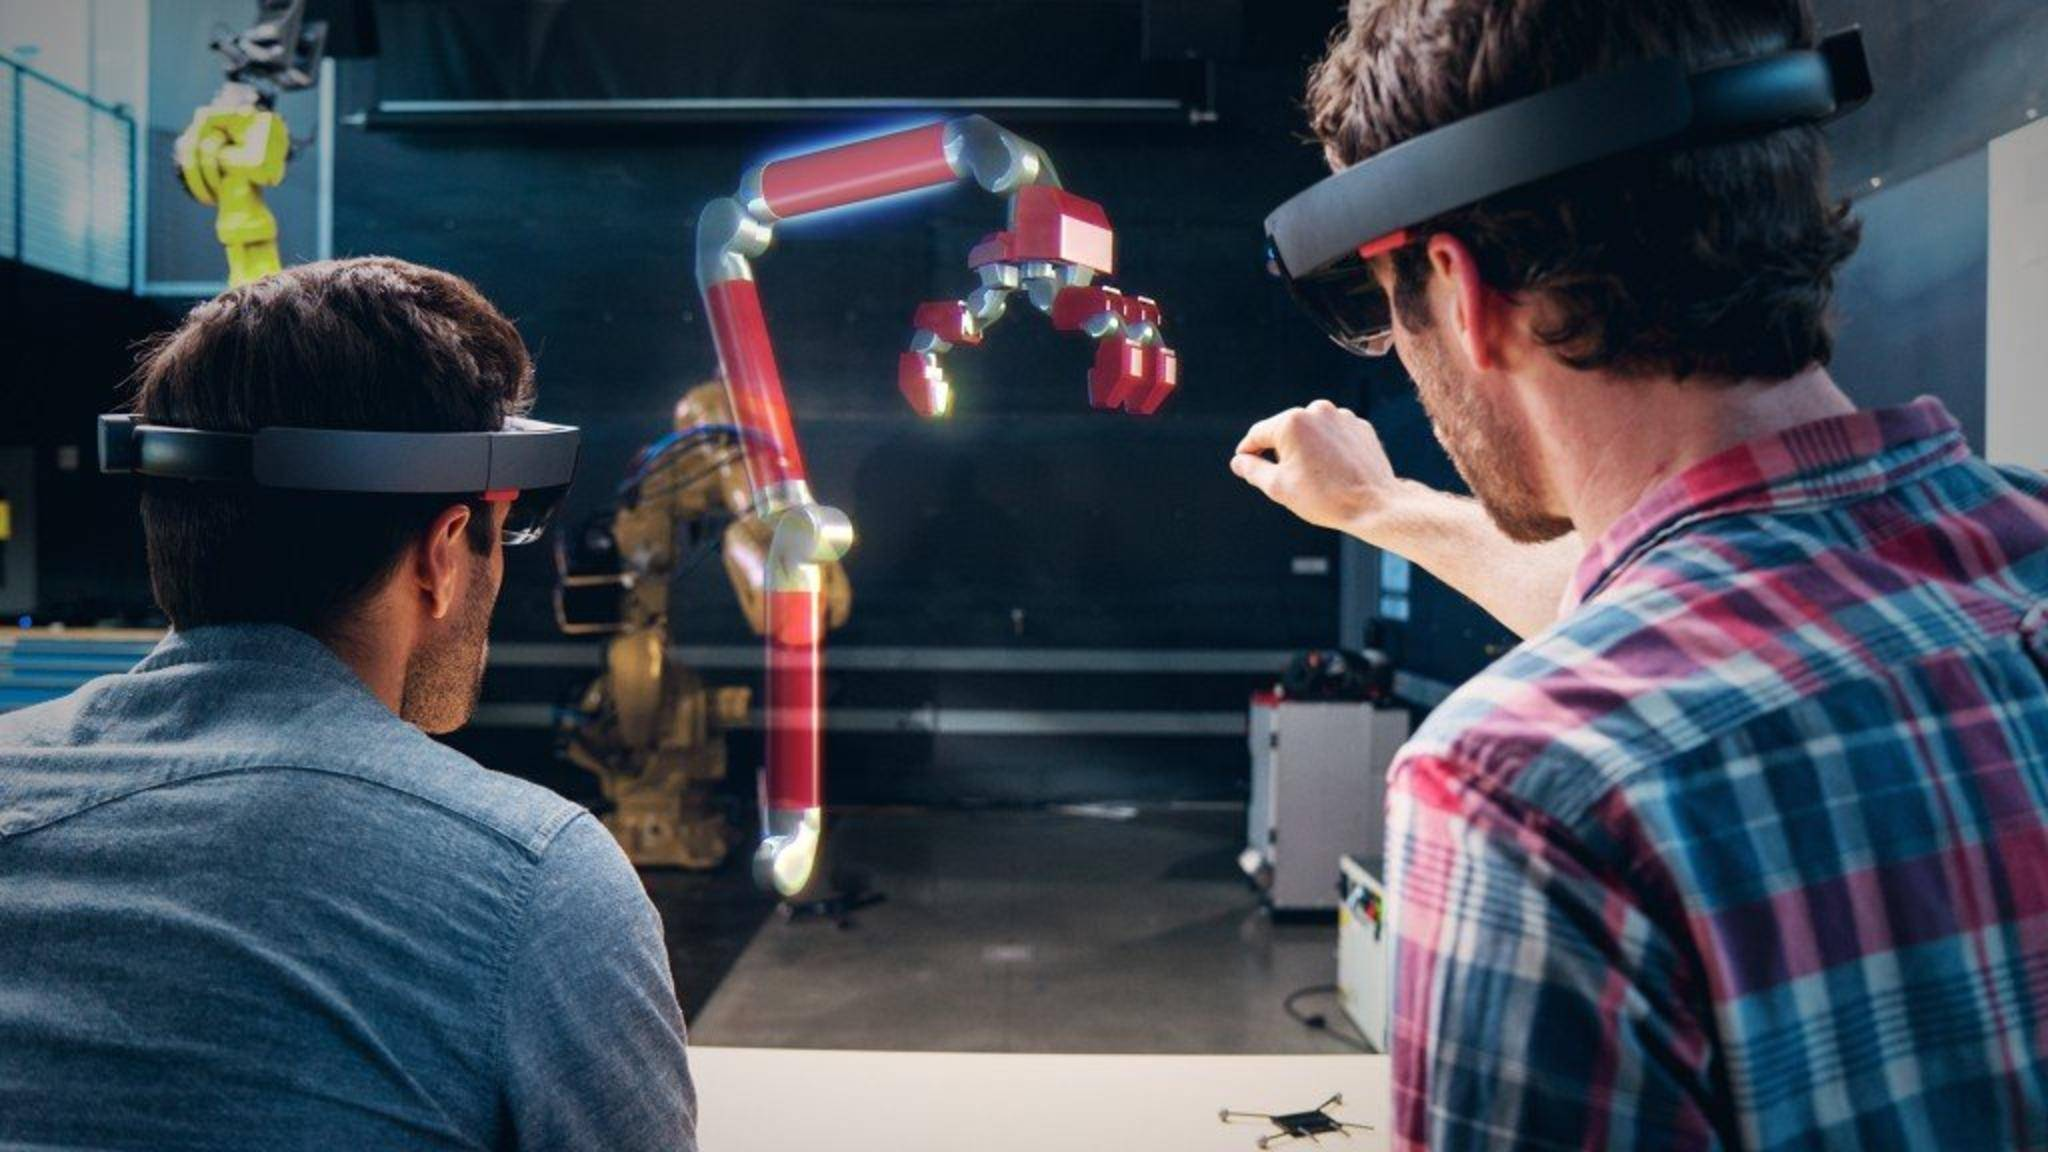 Die Microsoft HoloLens projiziert Hologramme in das Sichtfeld des Trägers.